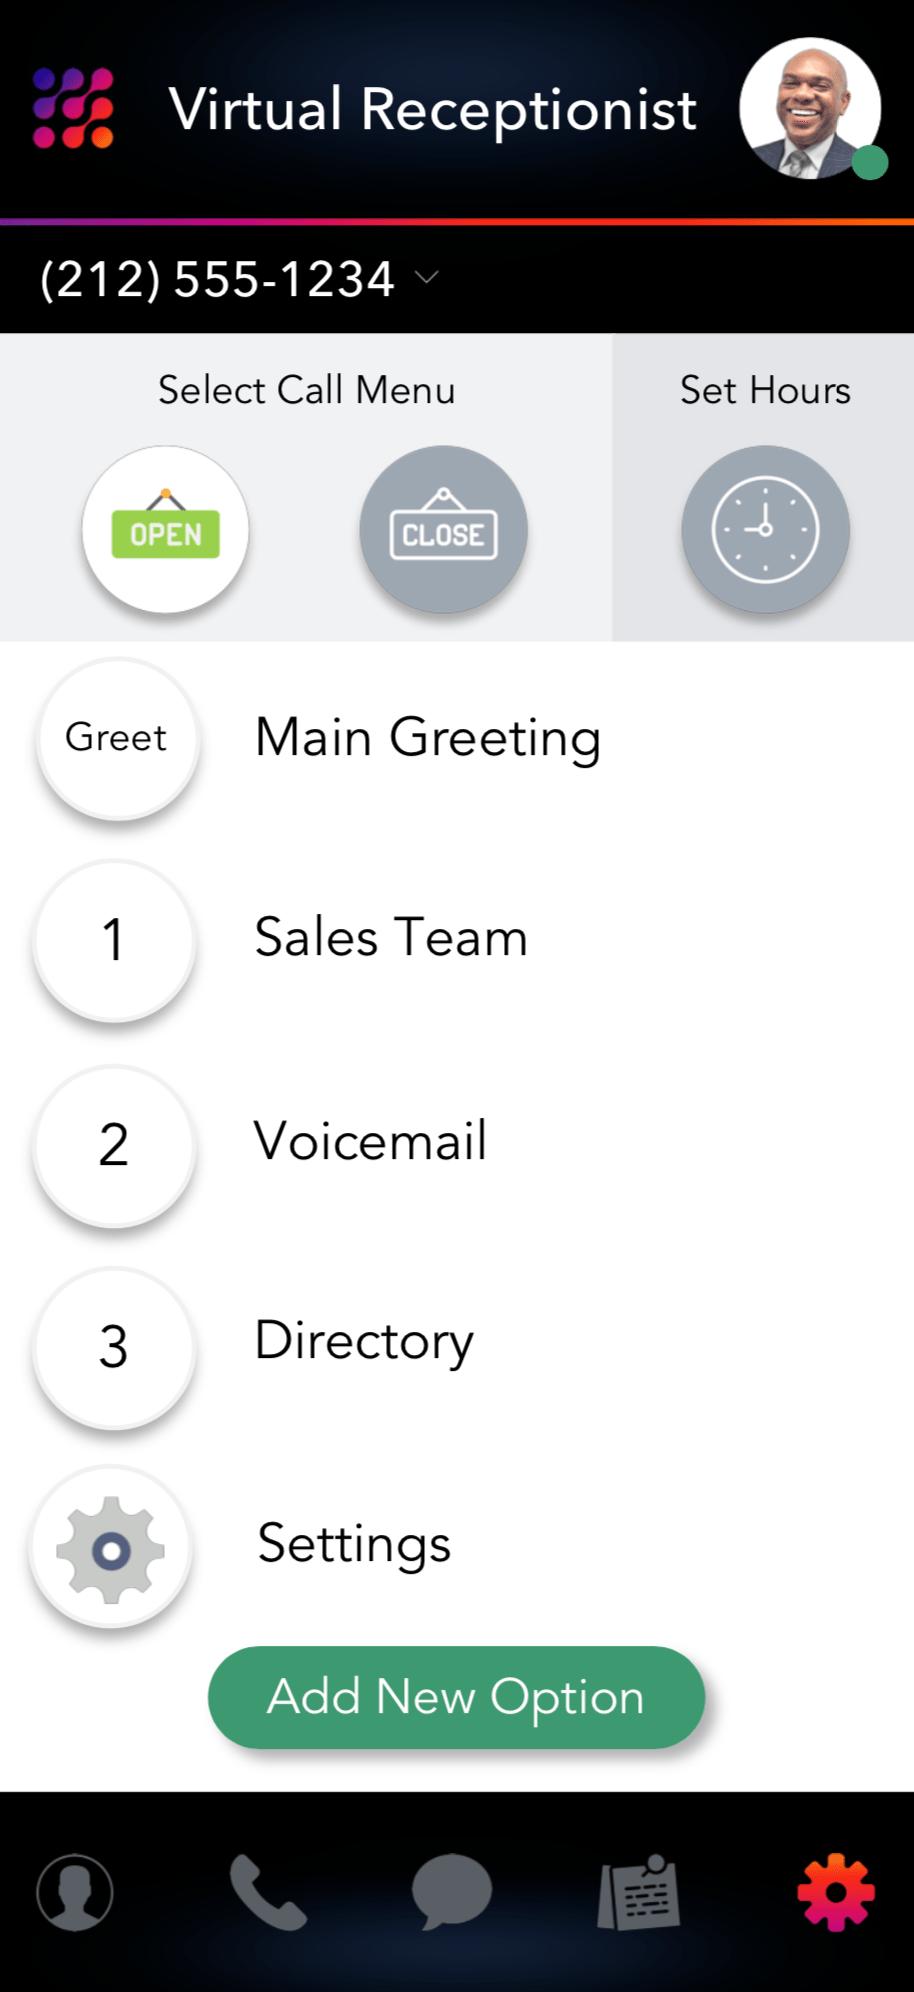 LinkedPhone Mobile App Screenshot of Call Menu Options Configurations